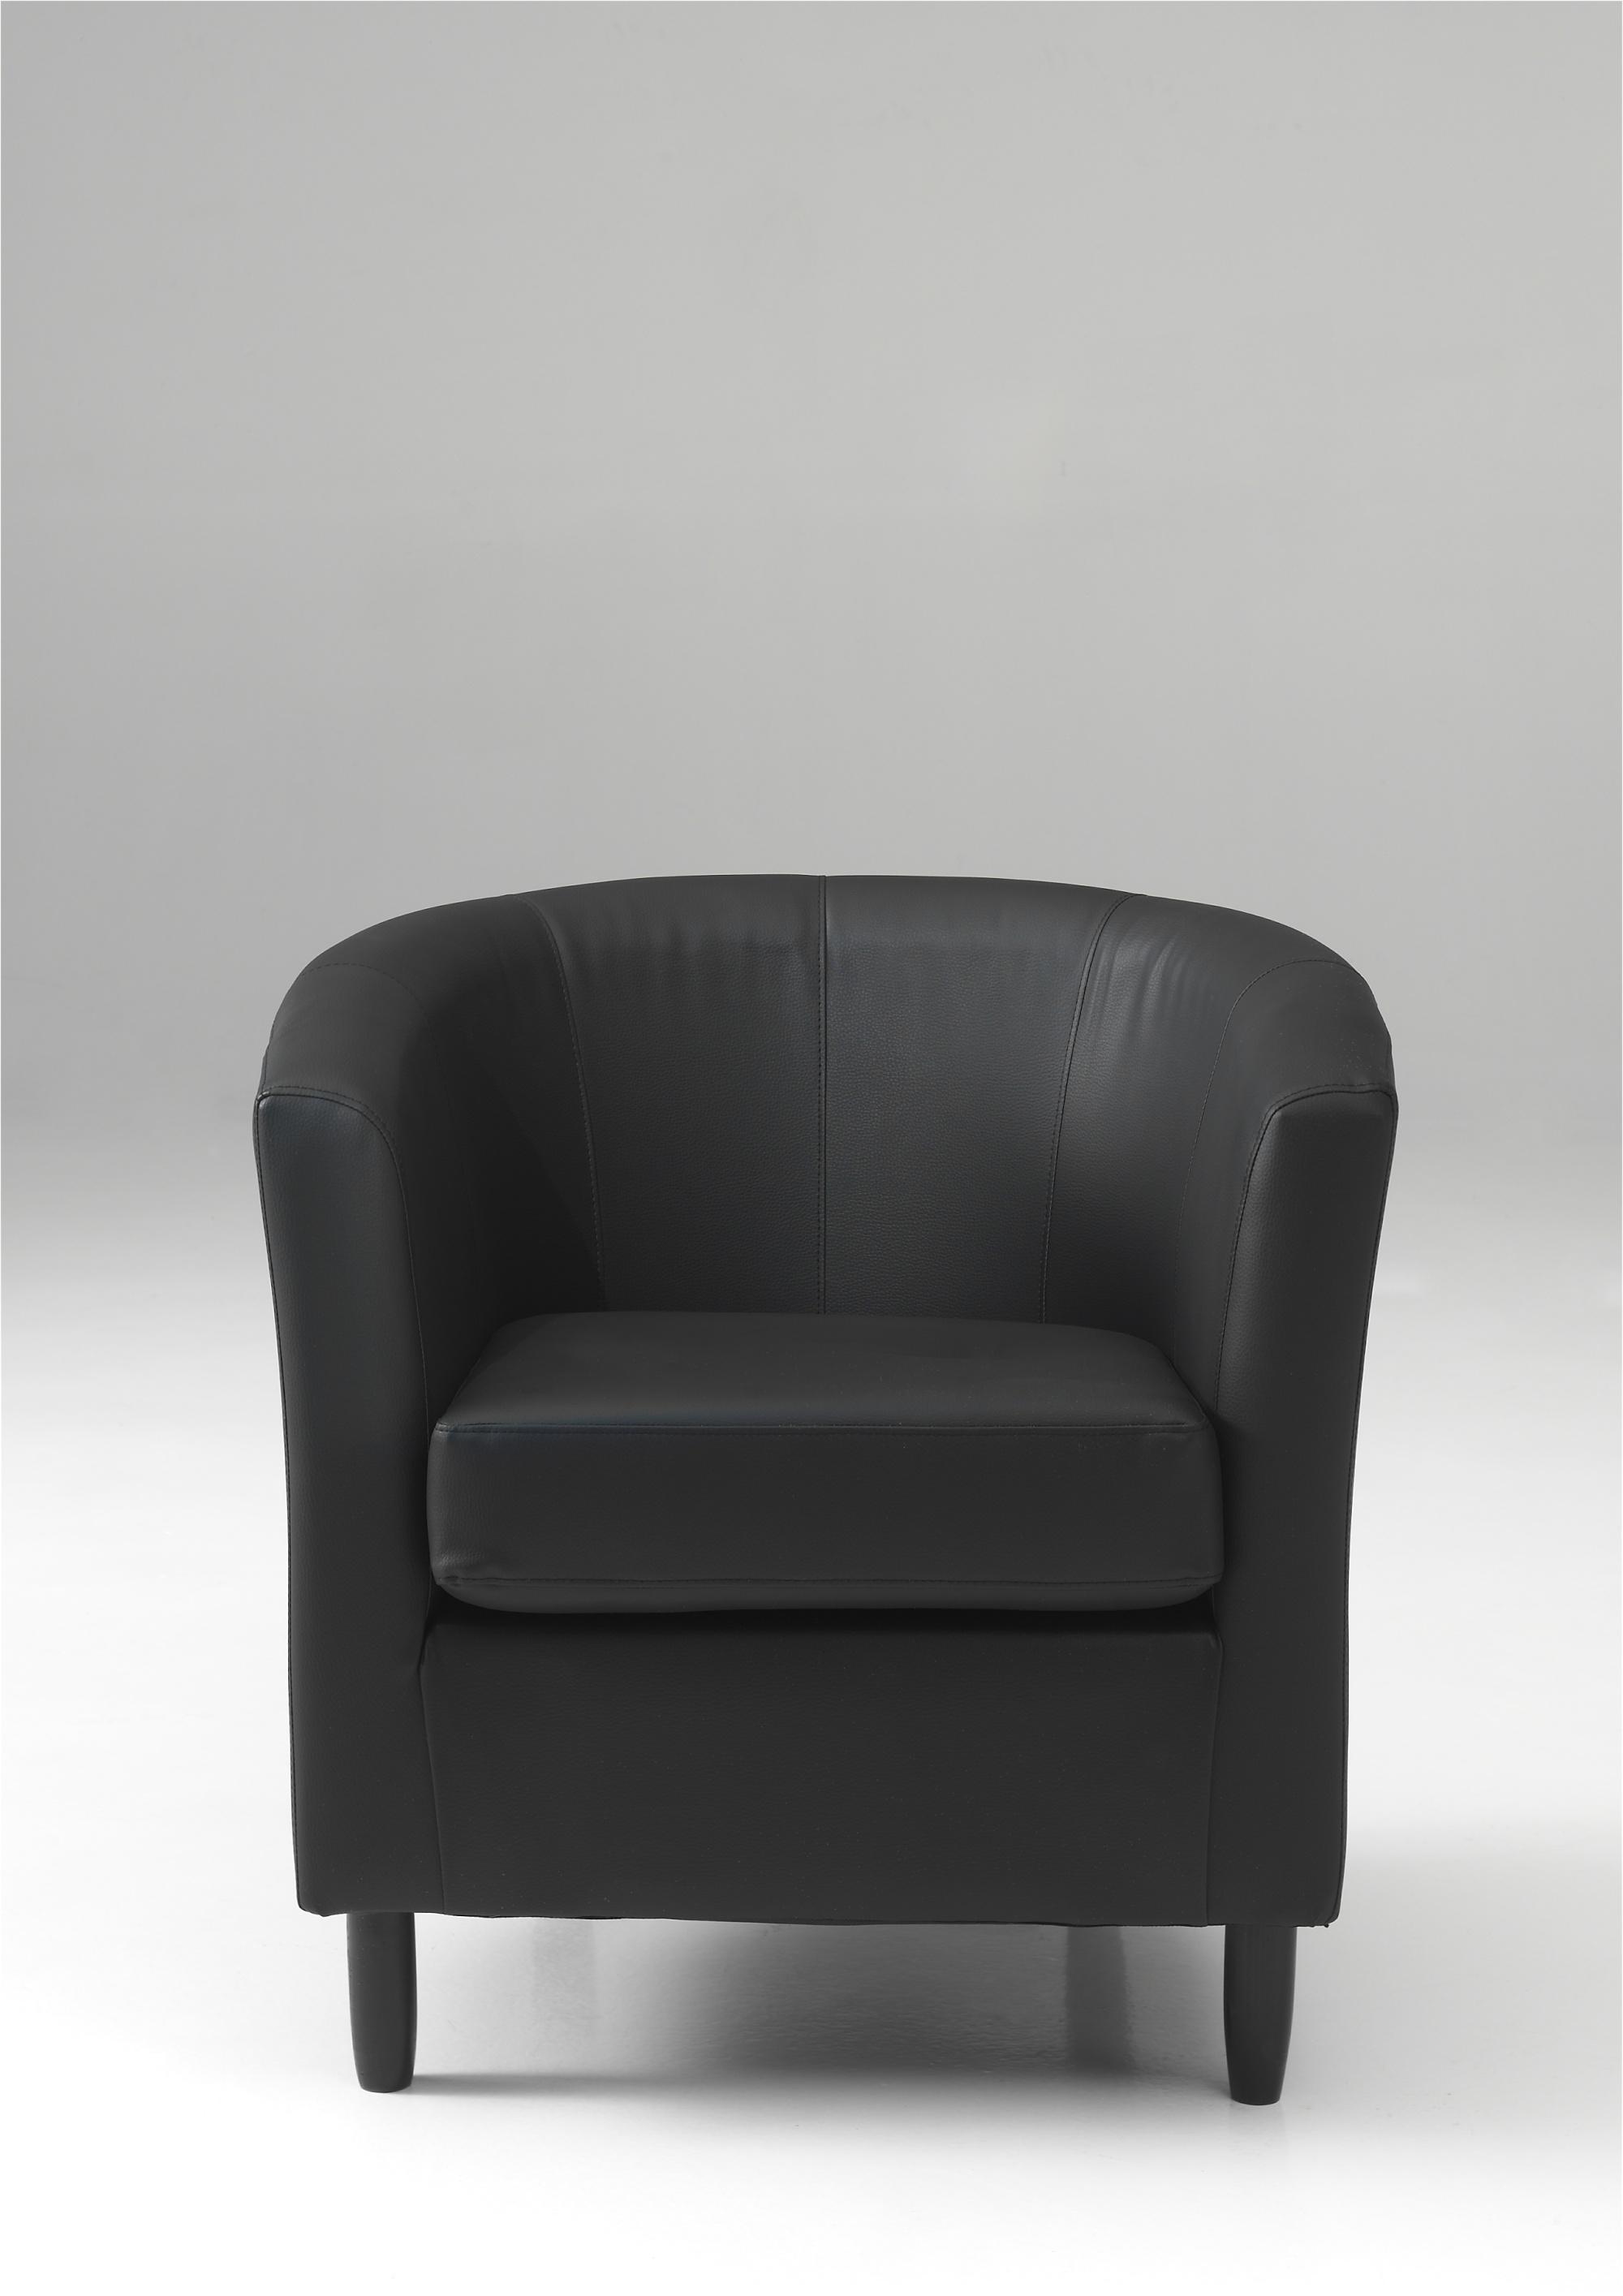 Fauteuil cabriolet en PU coloris noir Caurel